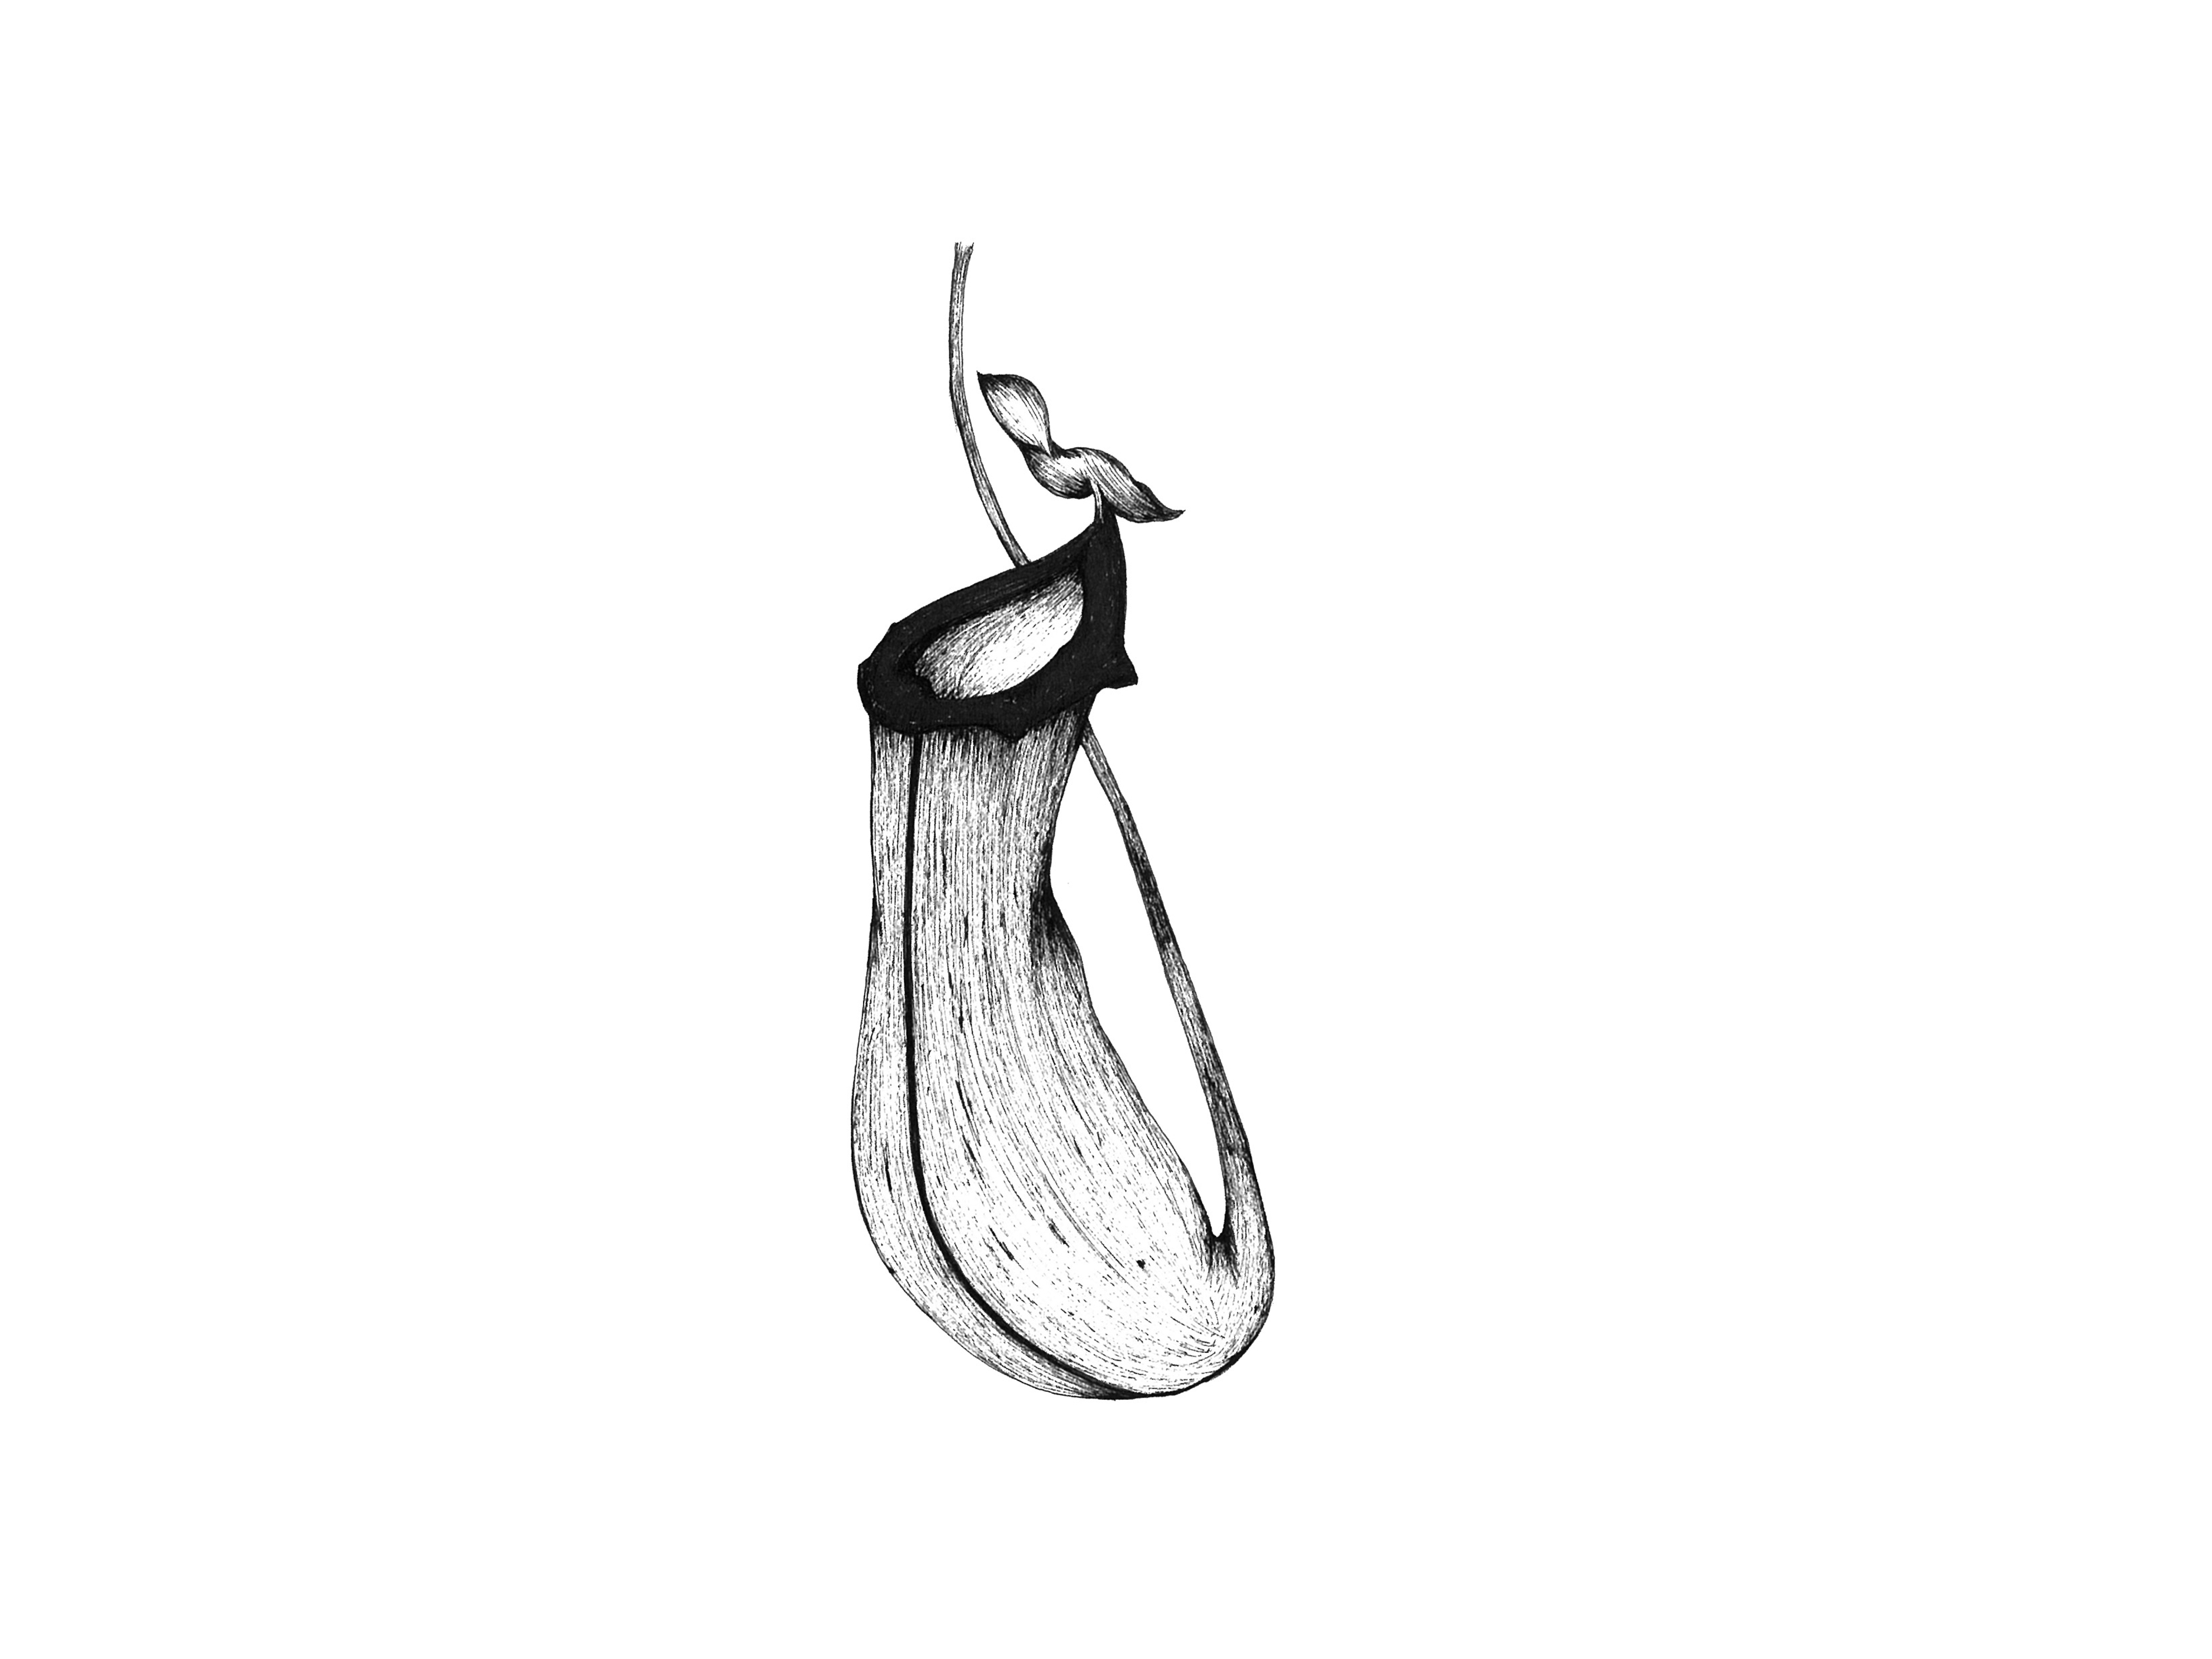 Nepenthes alata 原画作品